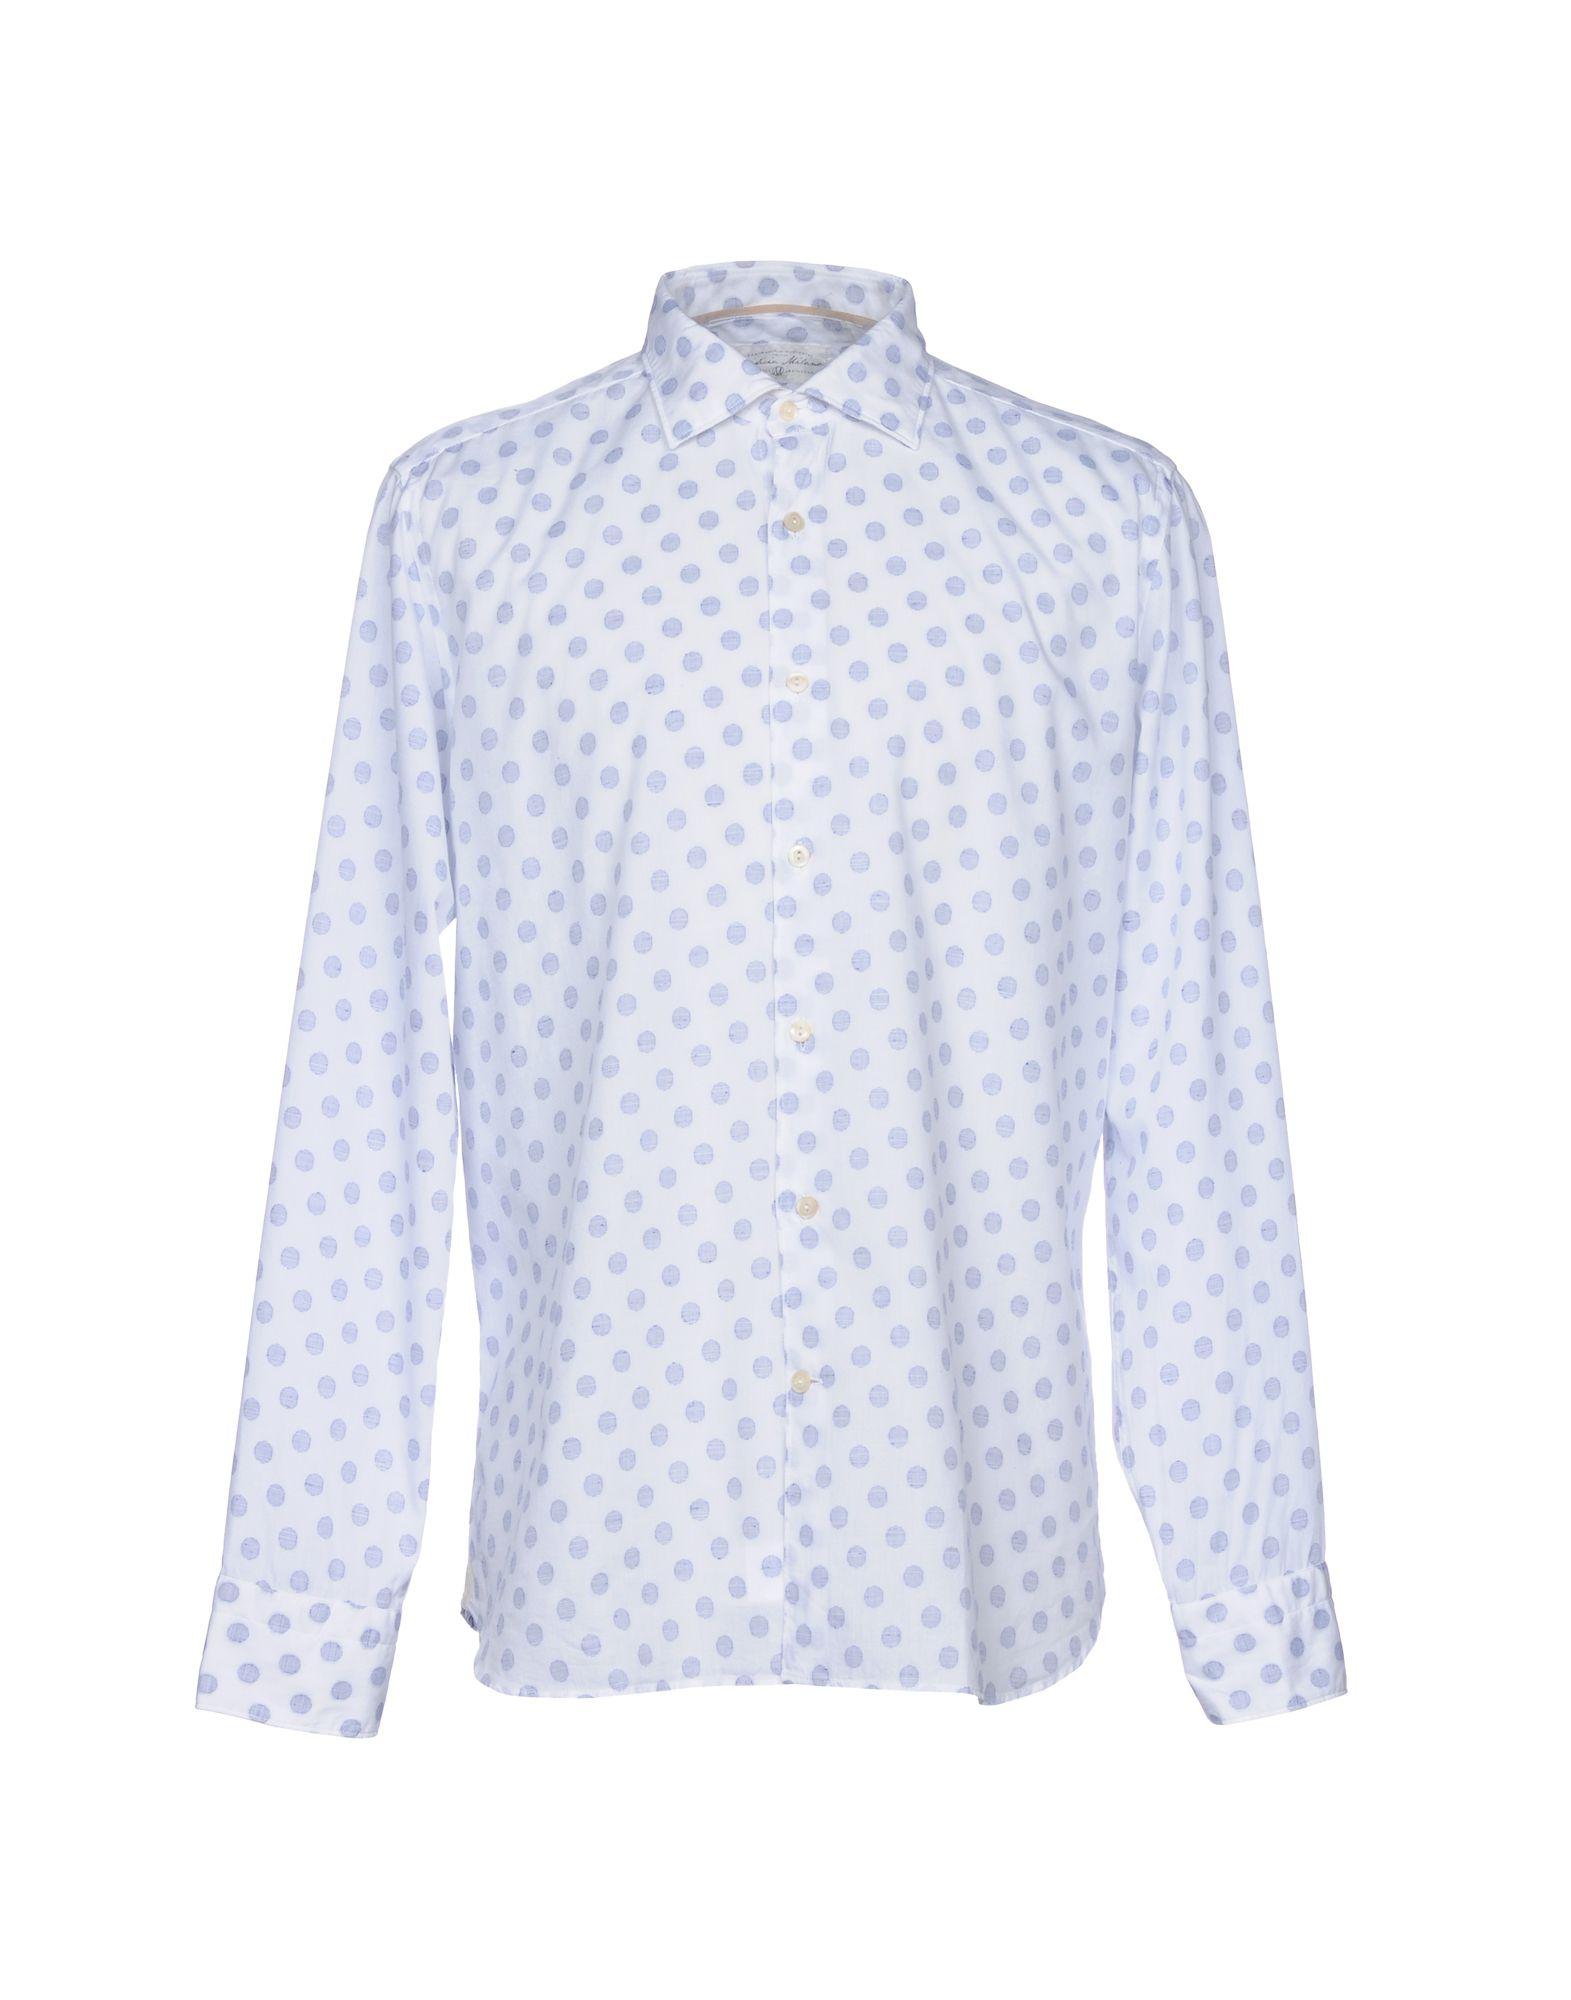 OPIFICIO MILANO M Pубашка блуза xs milano блузы в горошек